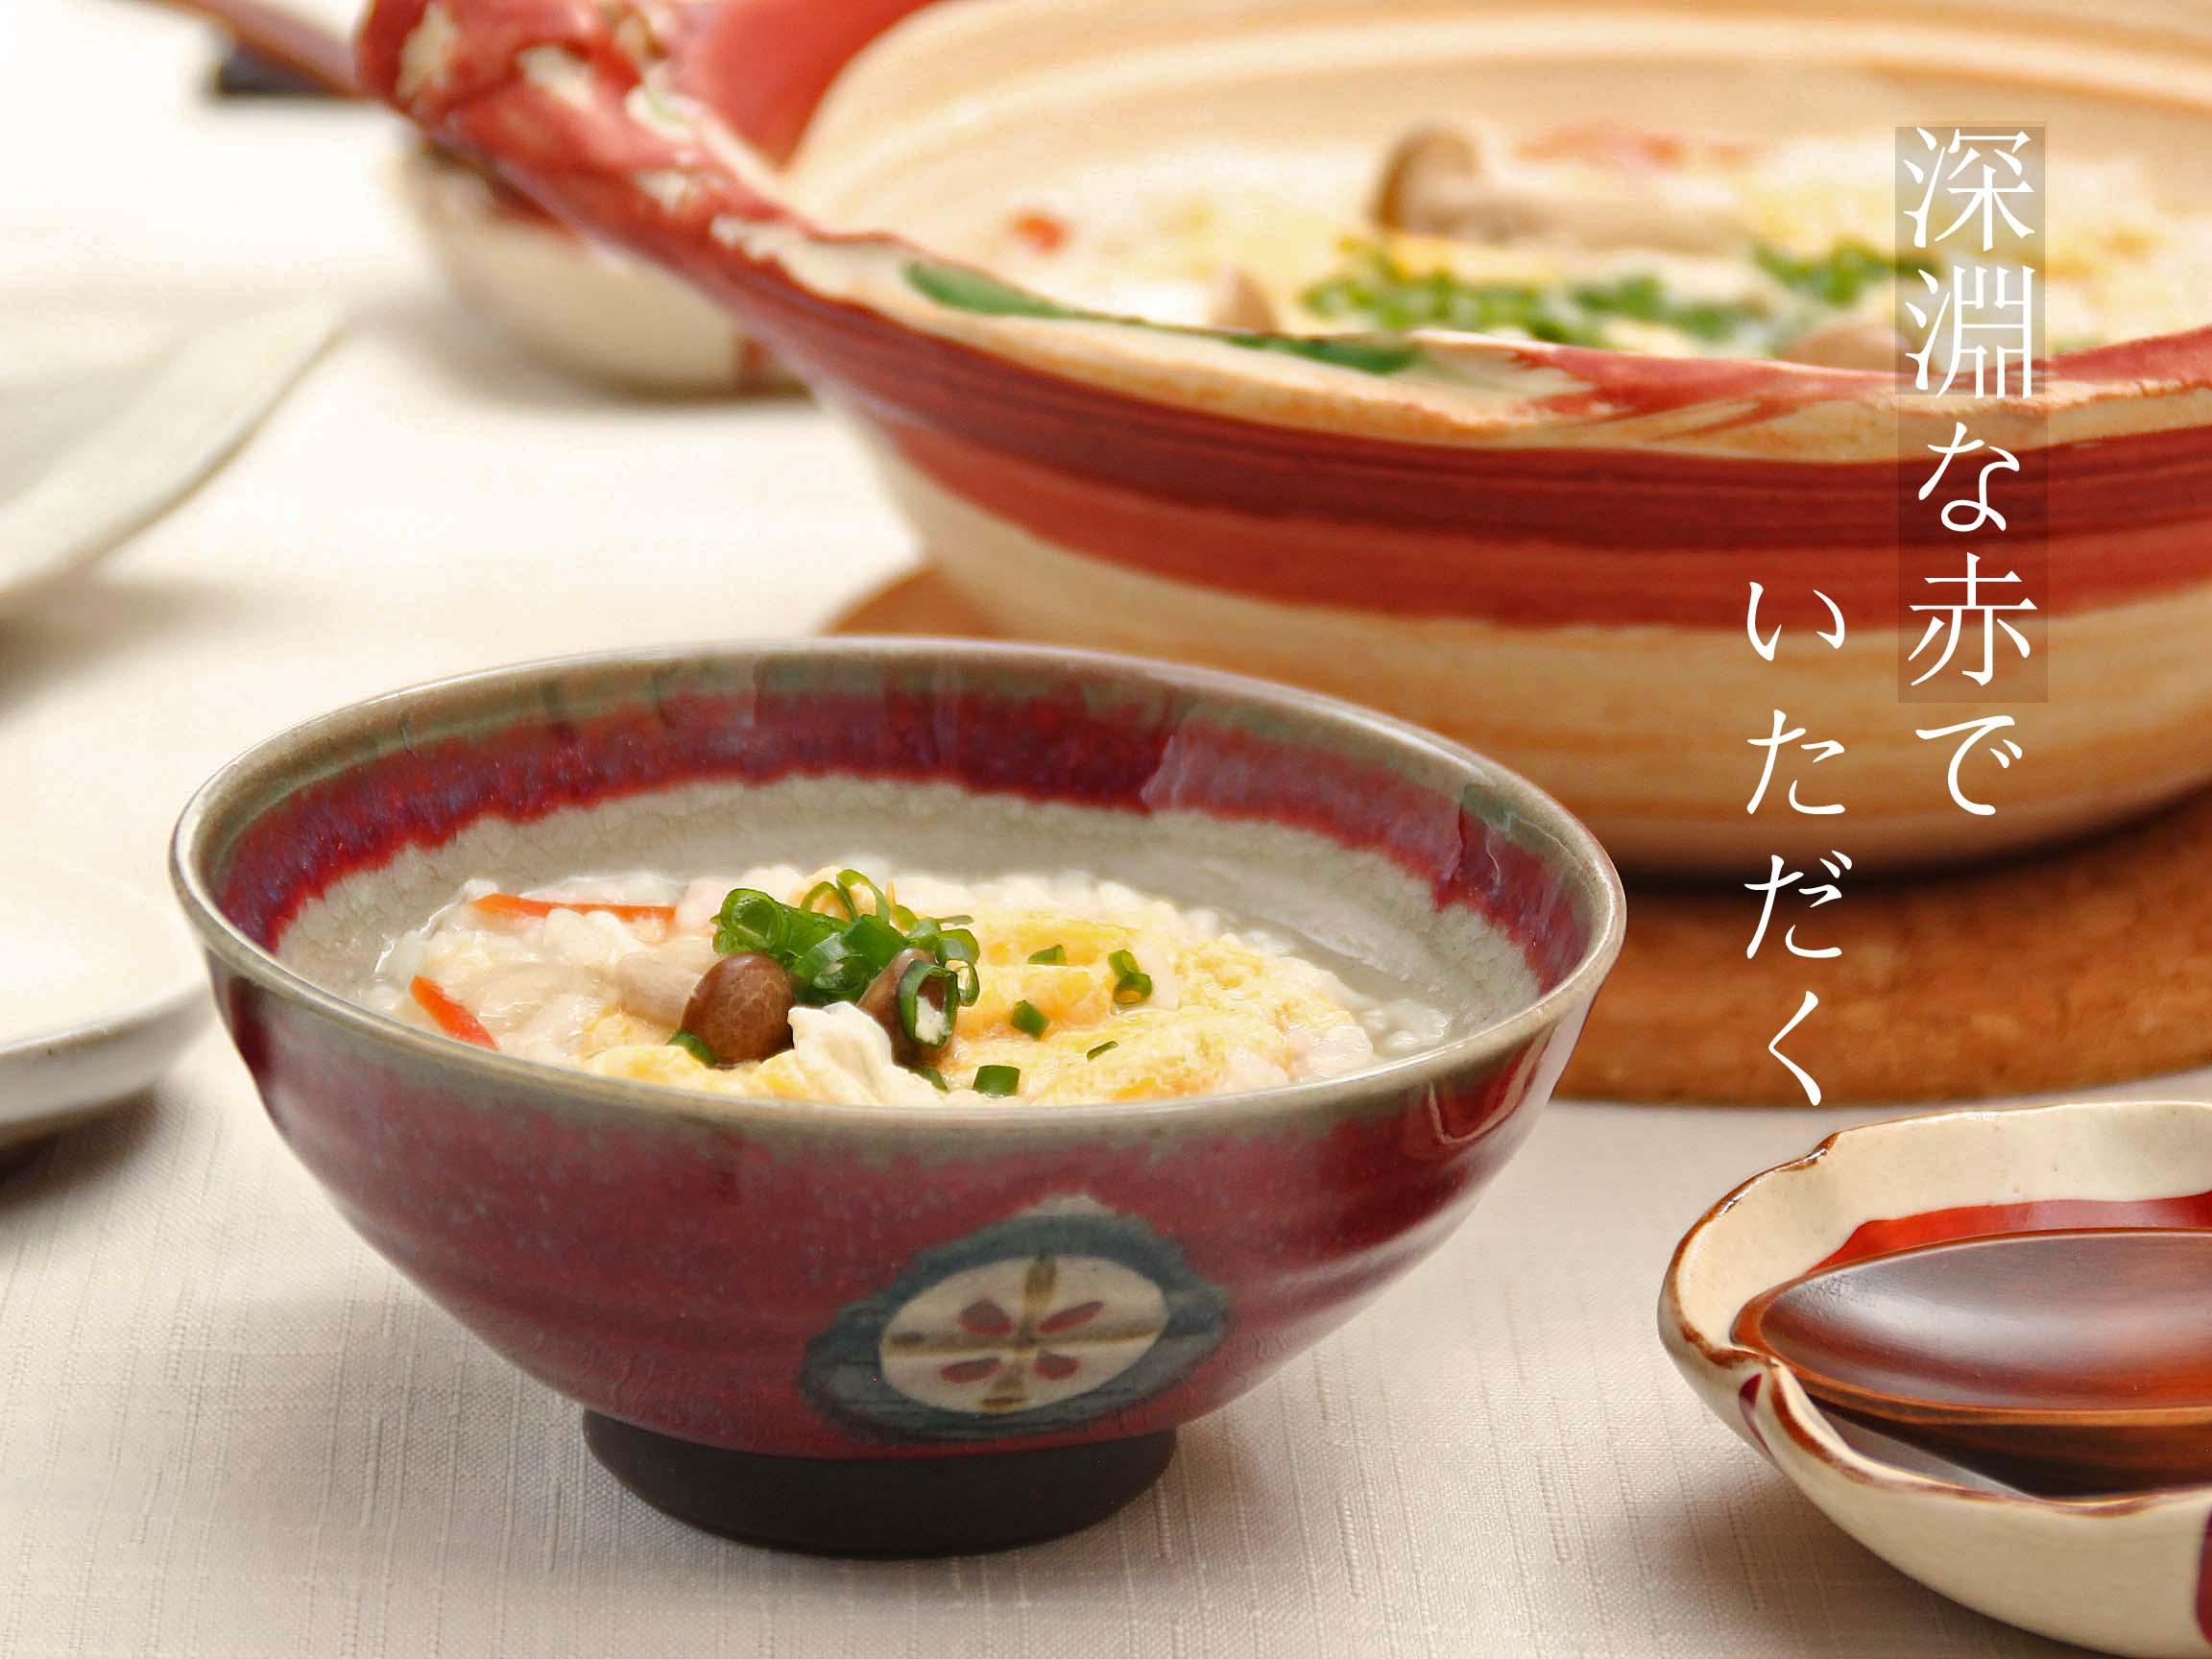 辰砂花紋ご飯茶碗